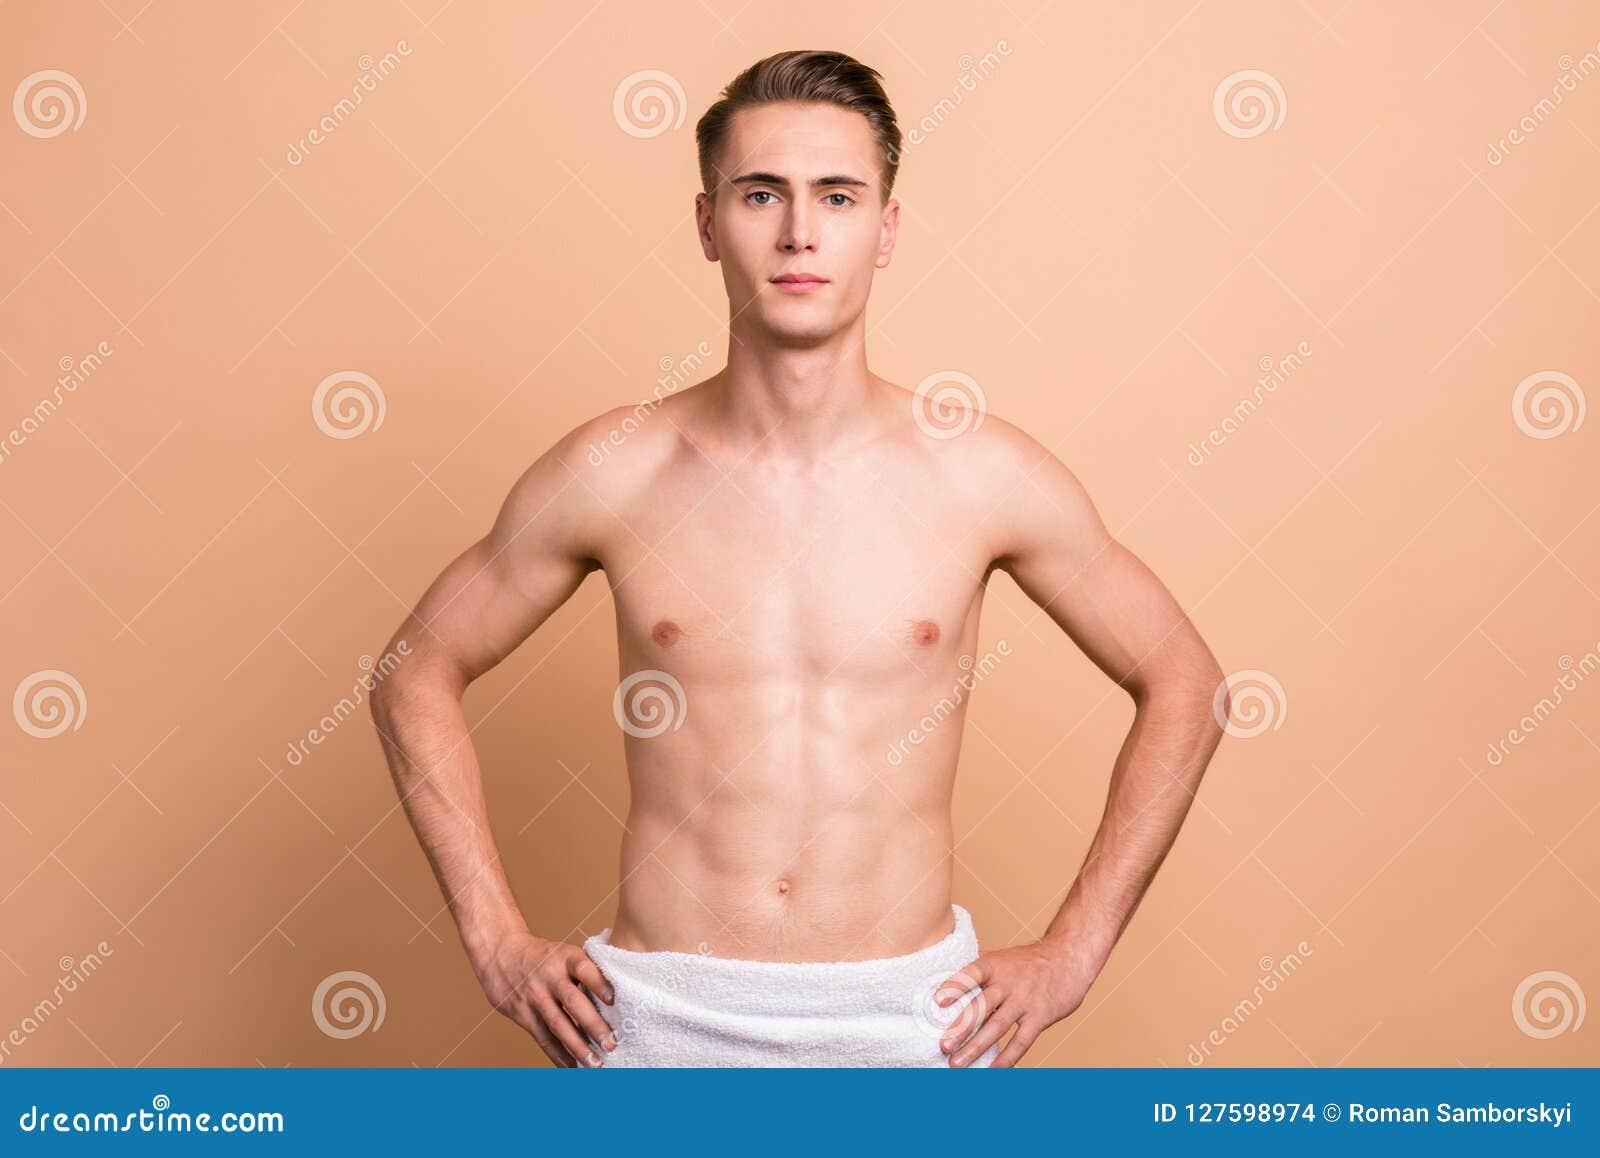 Naked amatuer cheerleader strippers